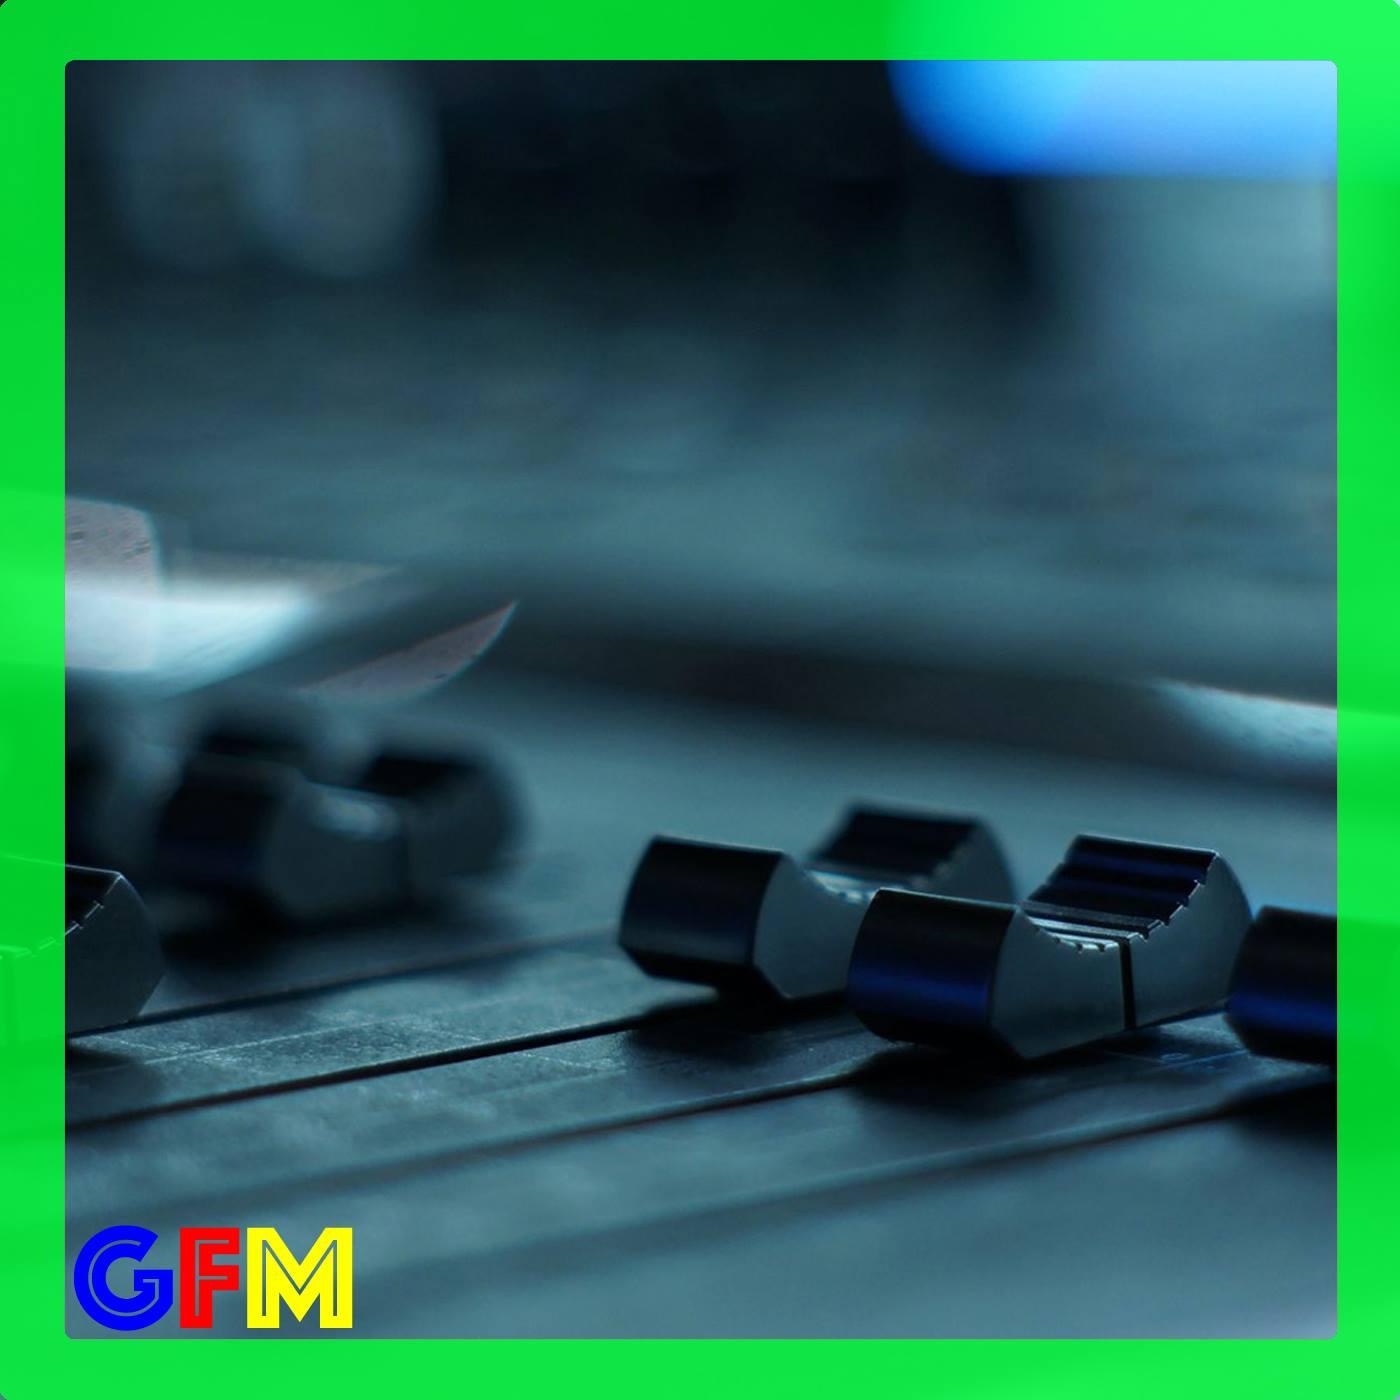 GFM 경주라디오-경주FM